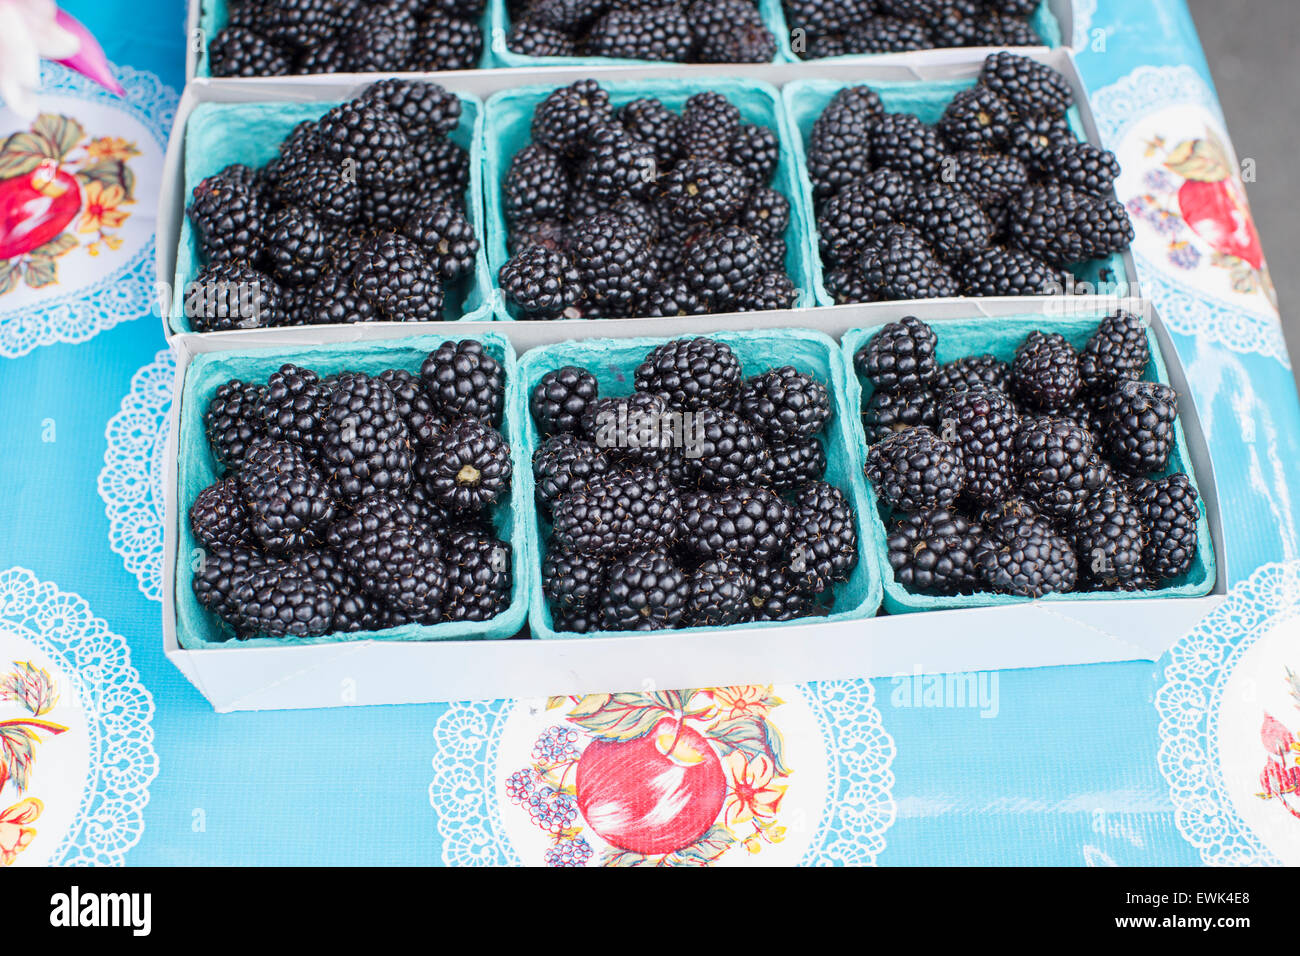 Baskets of fresh, local, organic blackberries at Sebastopol farmer's market, Sonoma County, Calif. - Stock Image